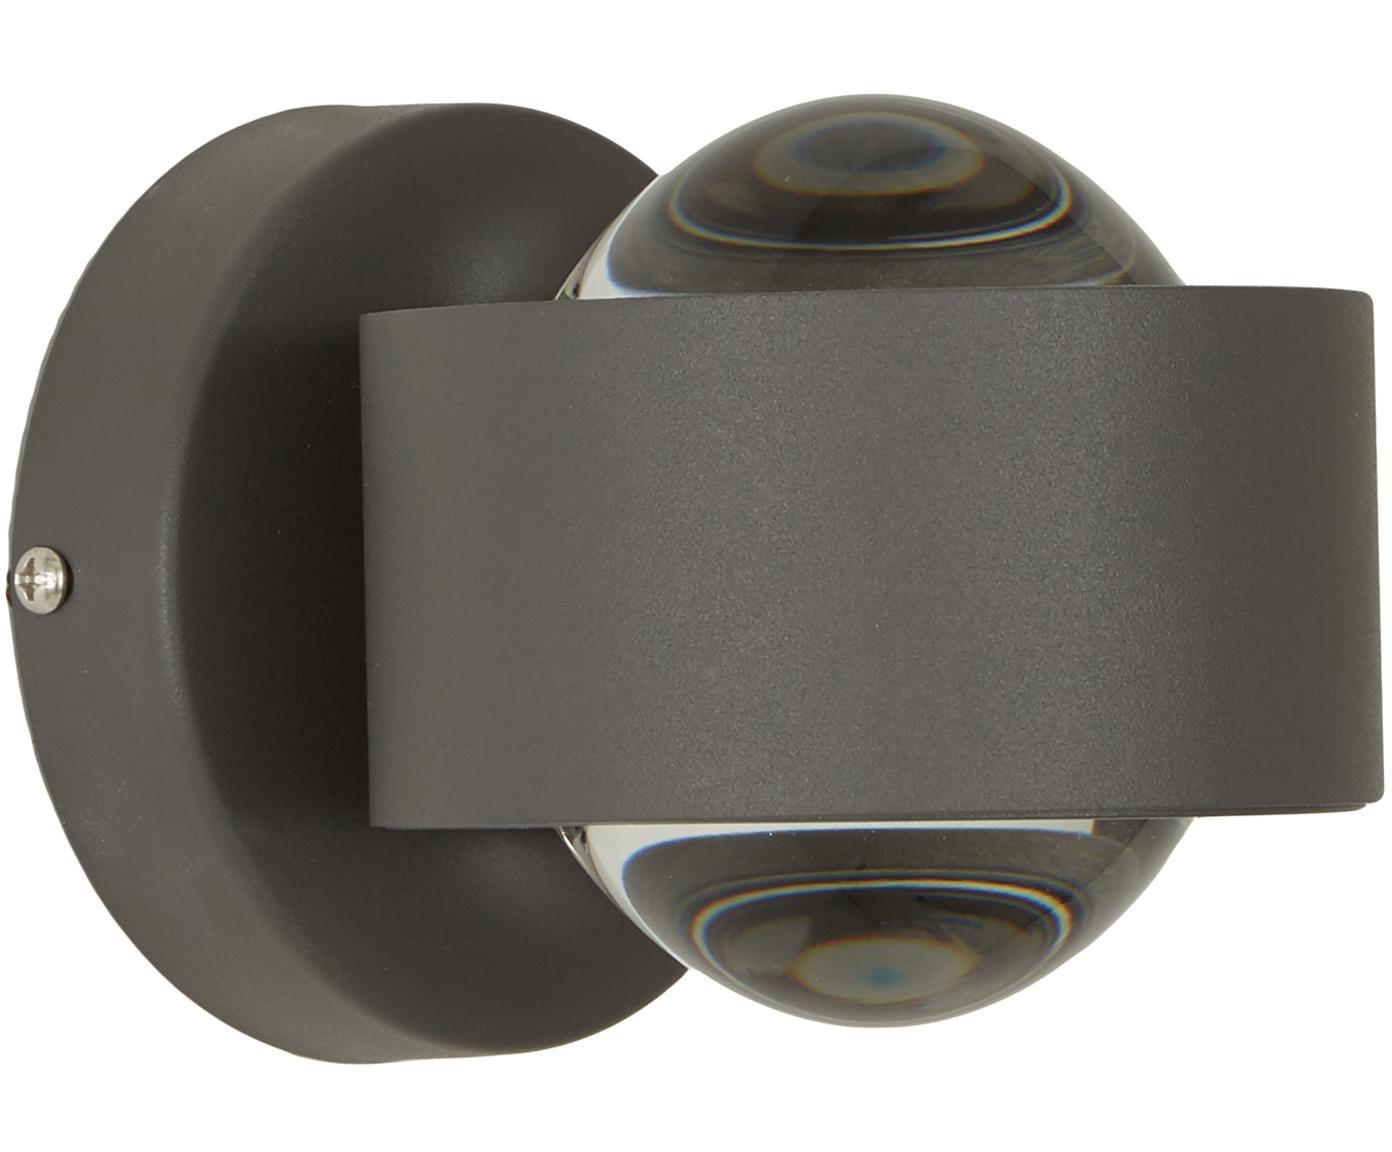 XS-LED wandlamp Ono, Zwart, 9 x 8 cm